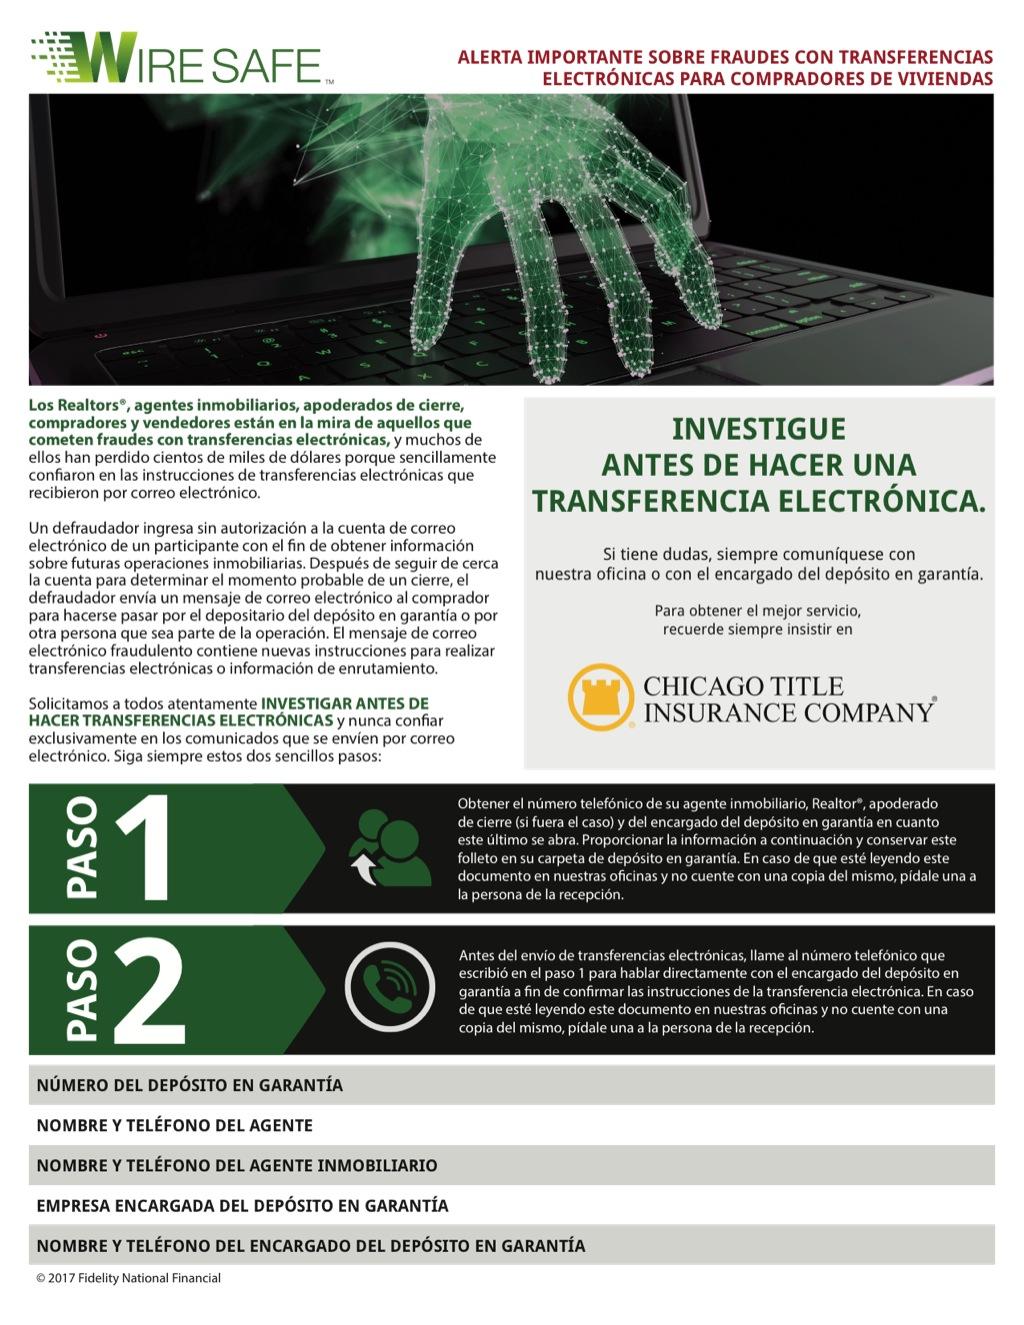 Corefact Wire Safe Buyer Flyer - Spanish - CTIC